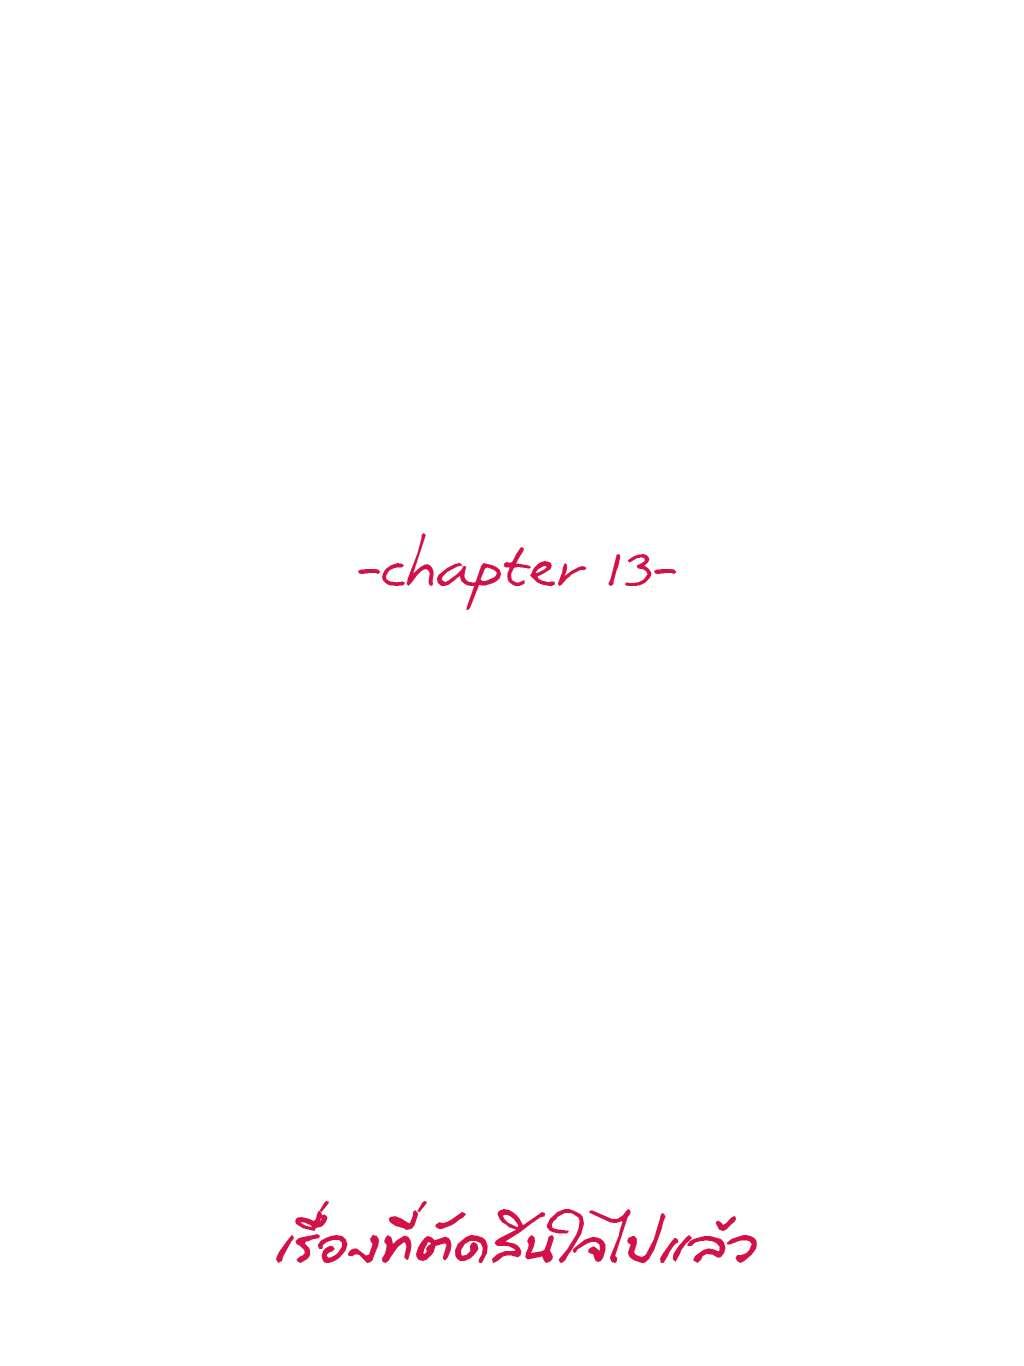 chapter 13 - เรื่องที่ตัดสินใจไปแล้ว